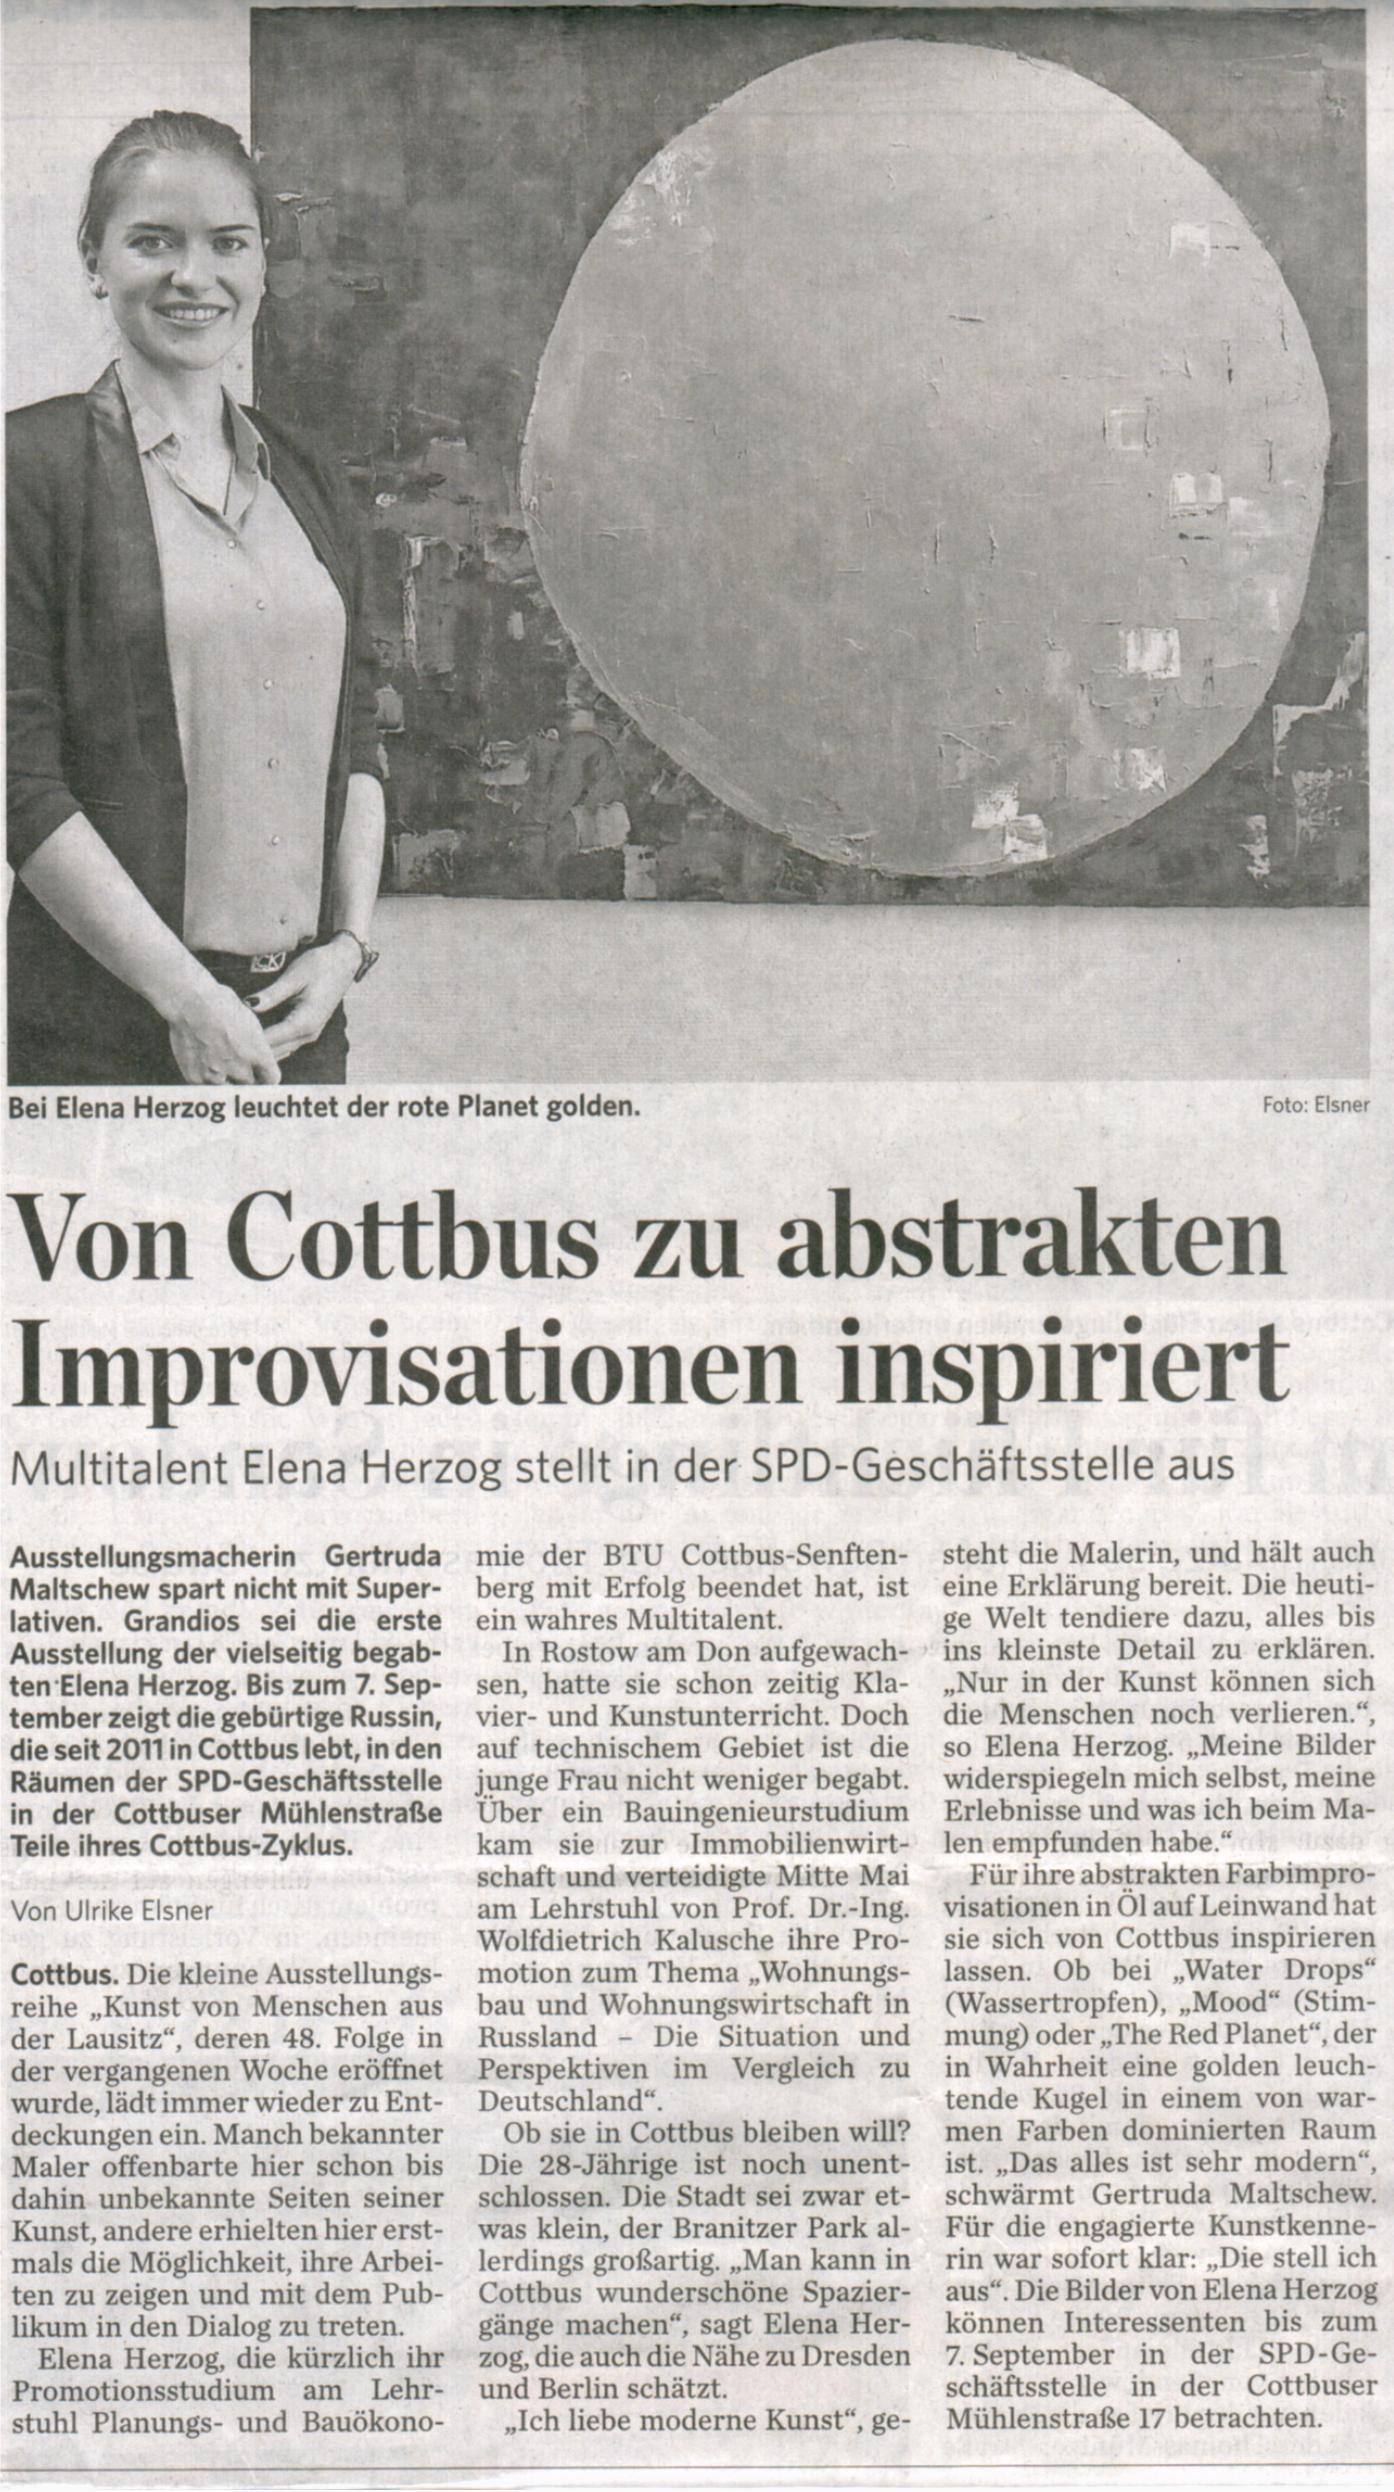 Lausitzer Rundschau | Cottbus | July 21 2015